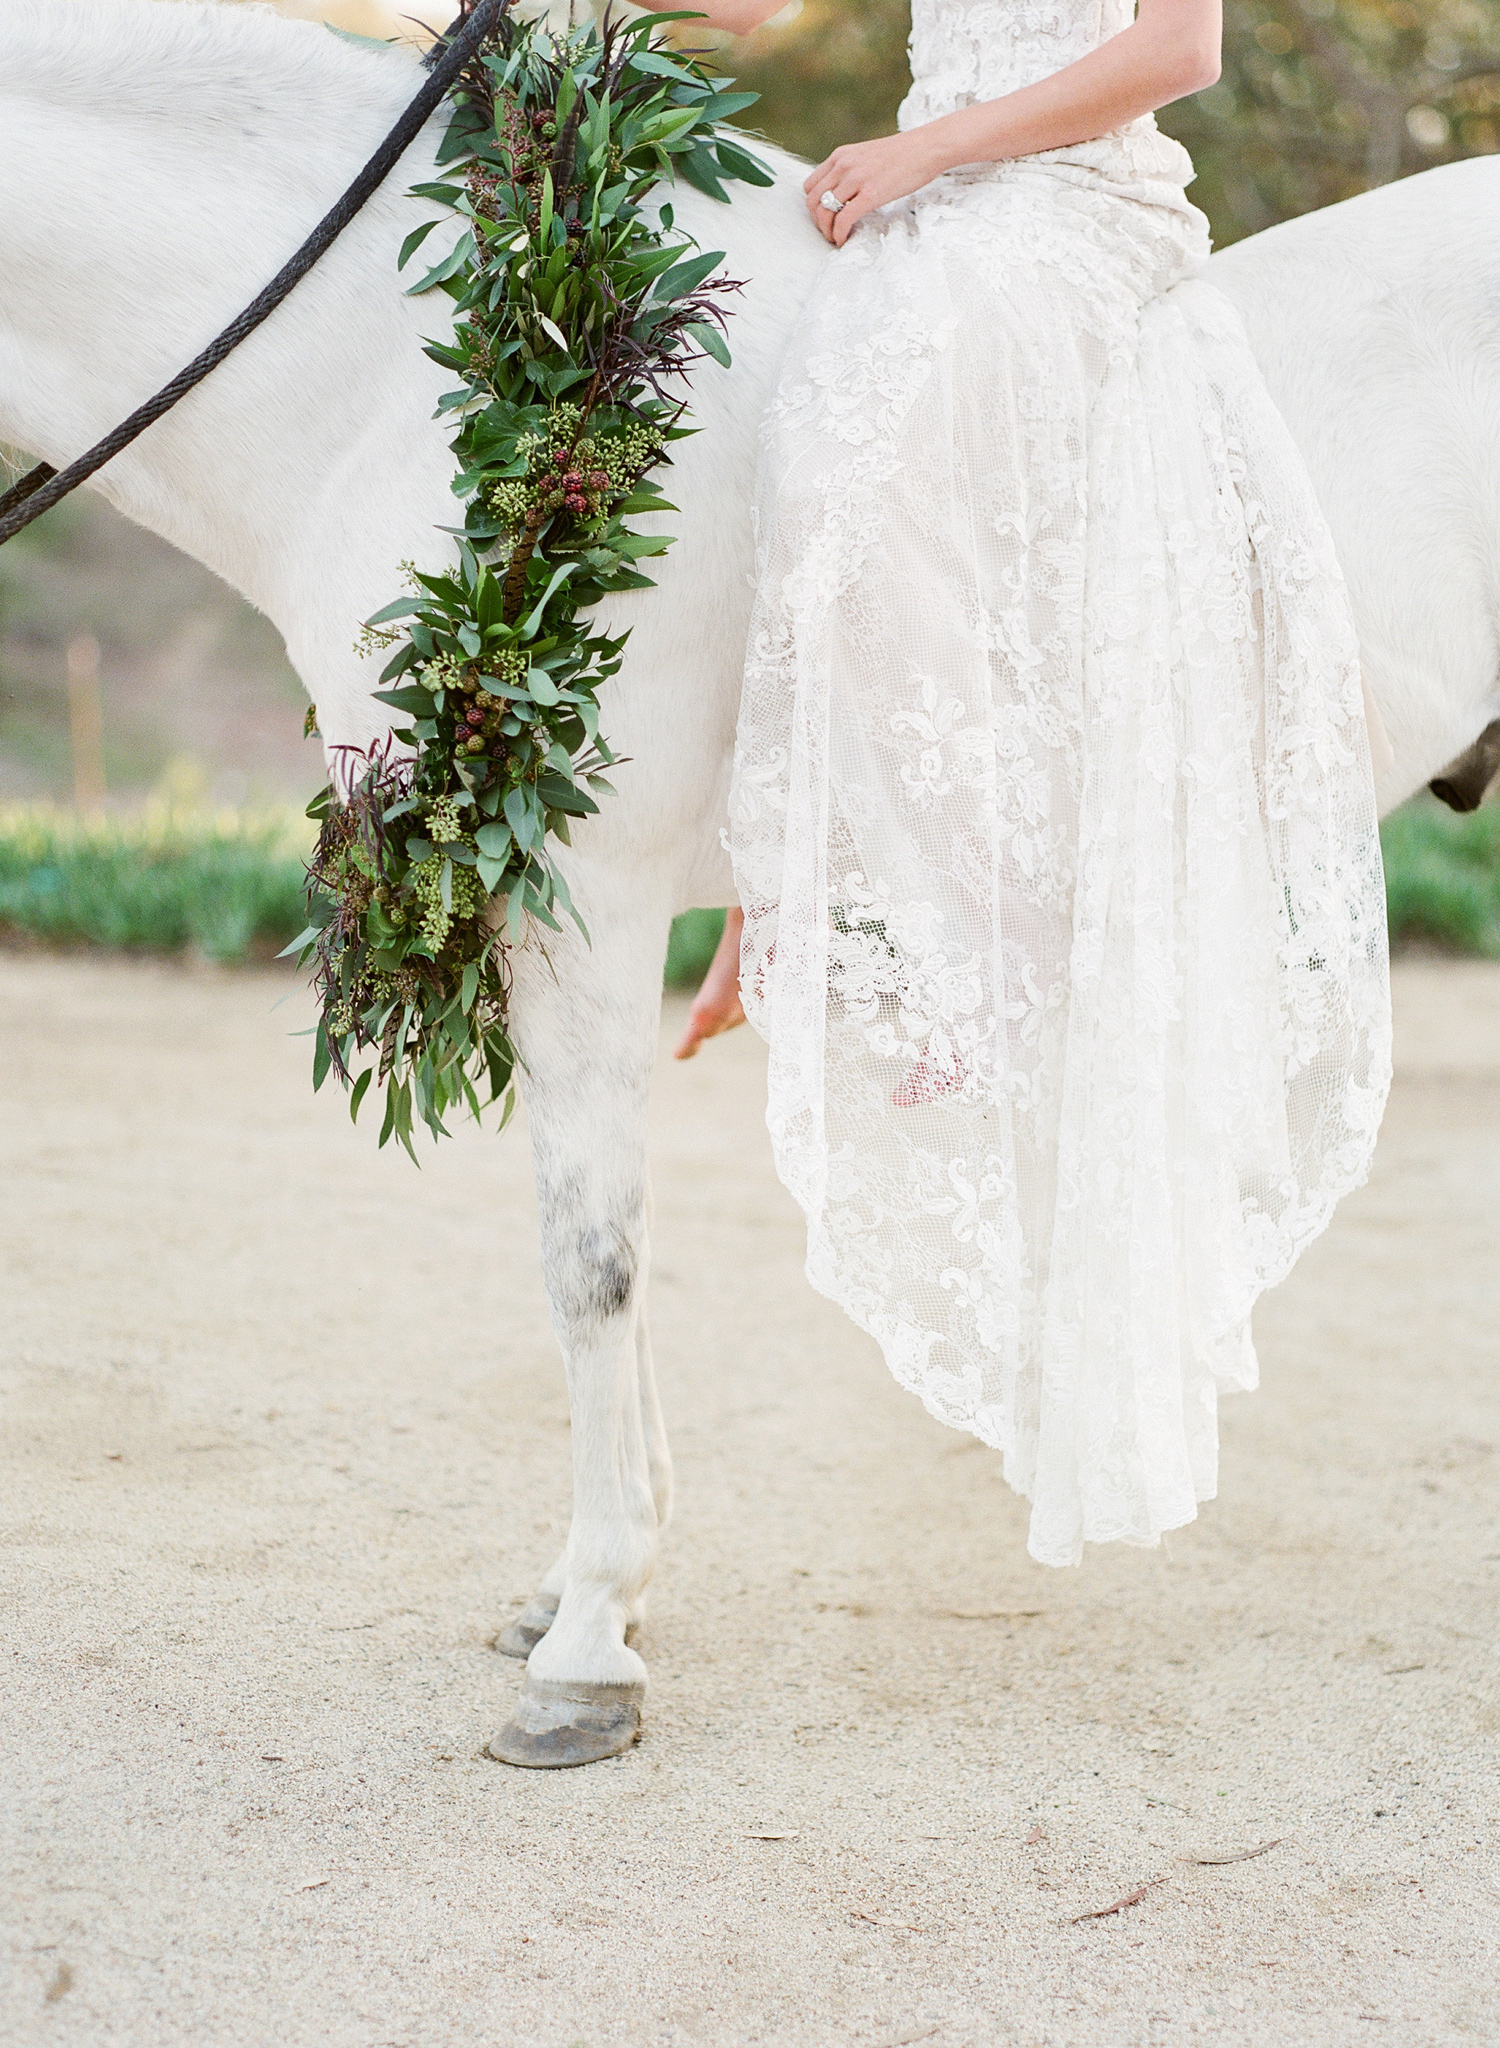 025-Jen-Wojcik-Photography-San-Diego-Wedding-Photographer.jpg